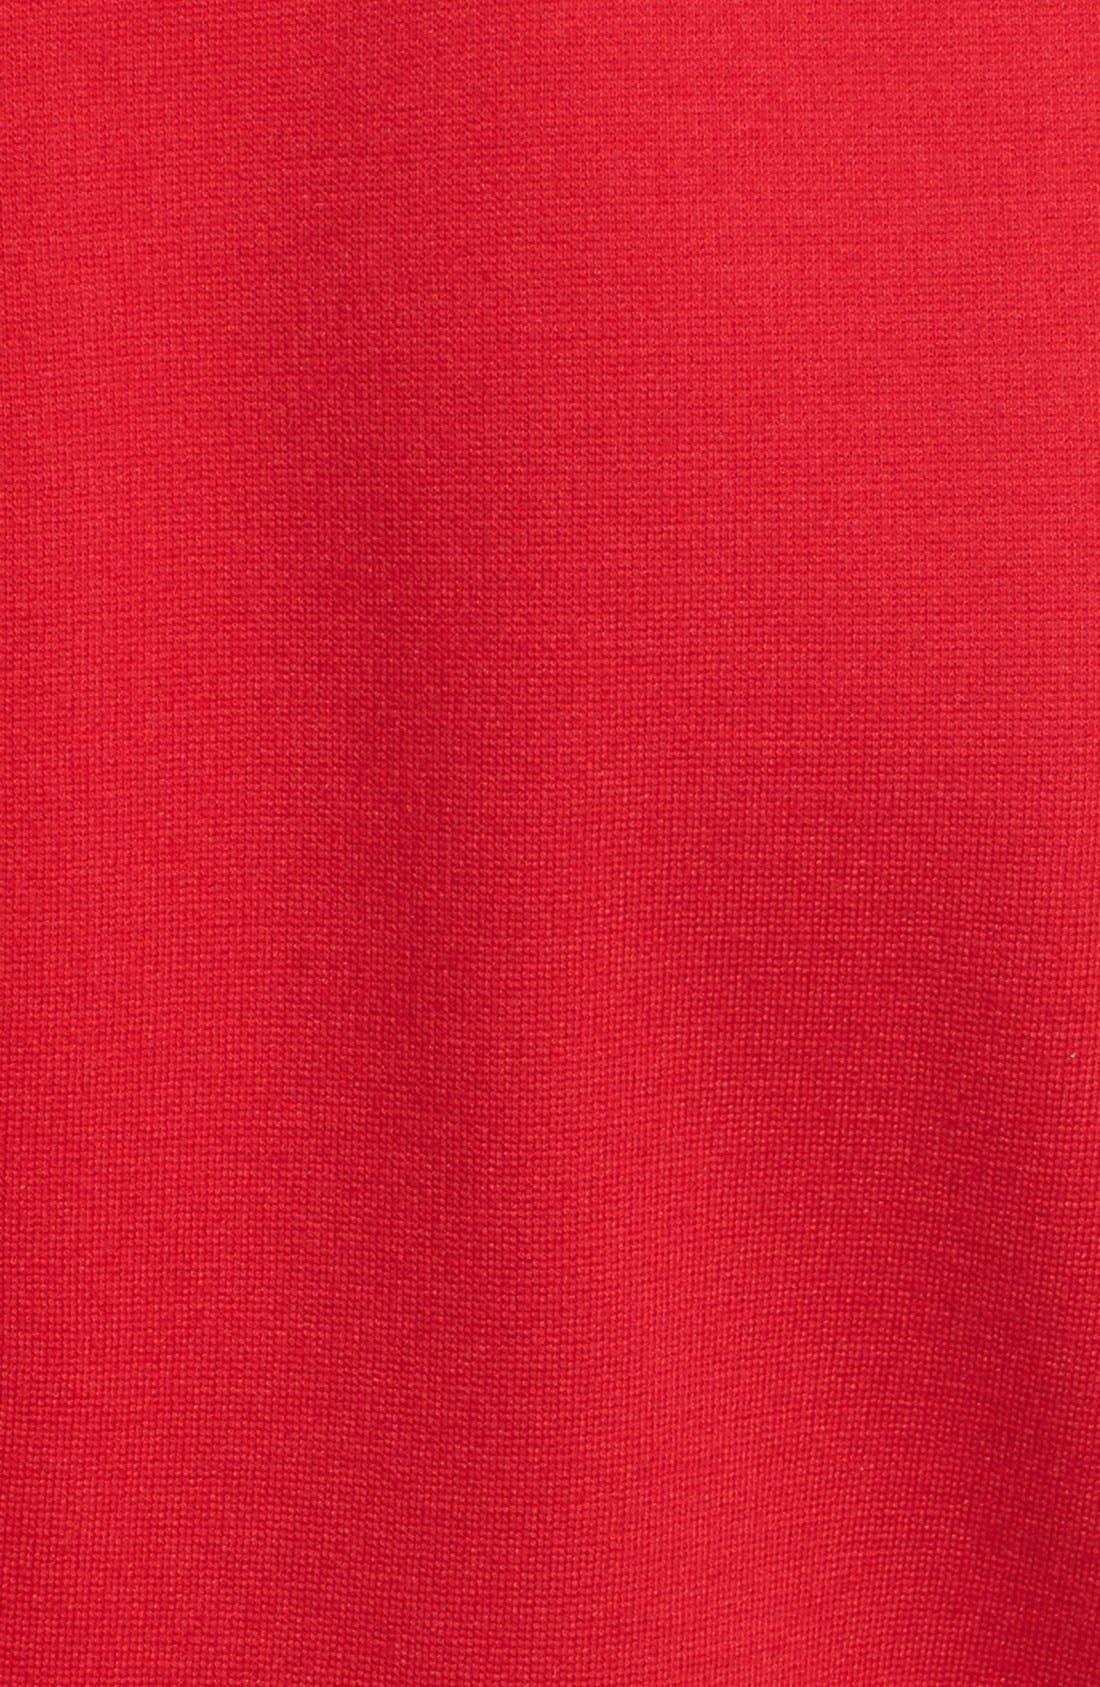 Alternate Image 3  - Ted Baker London 'Eelah' Embellished Collar Shift Dress